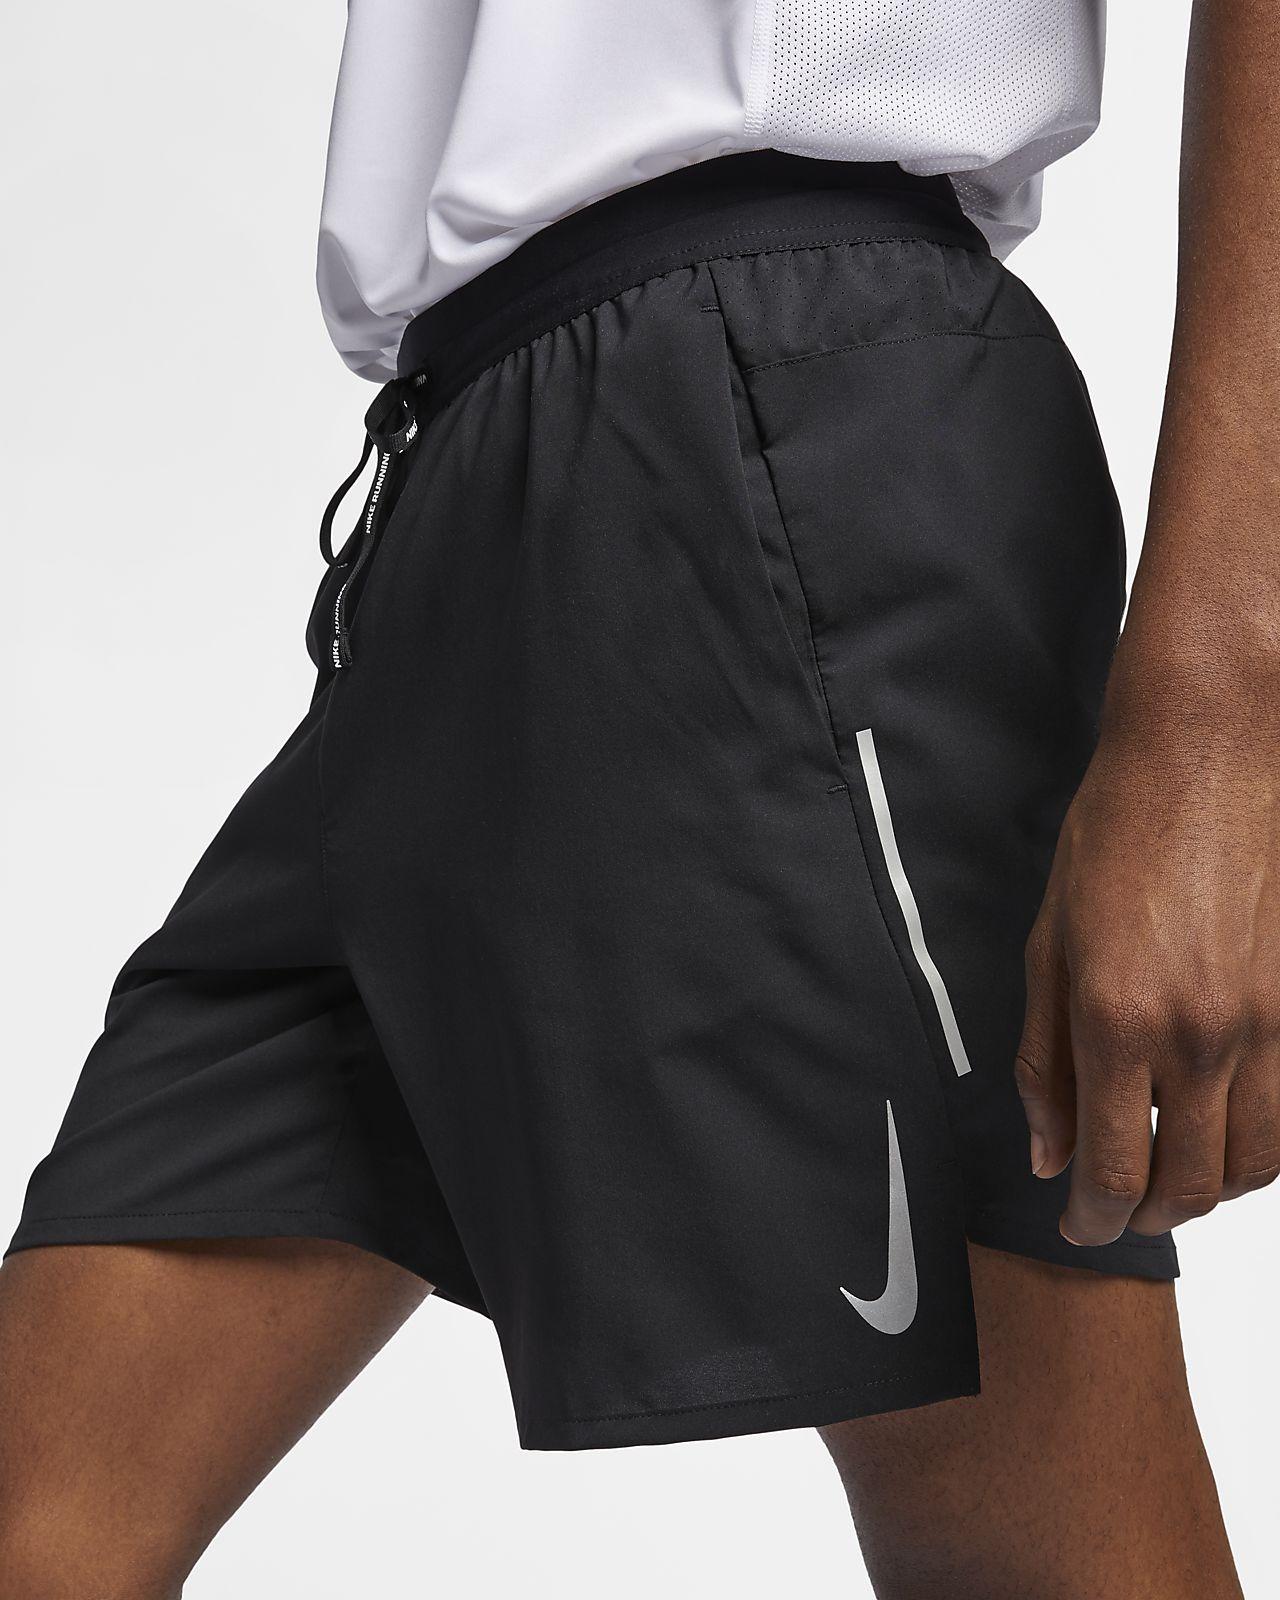 nike running shorts with zipper pockets